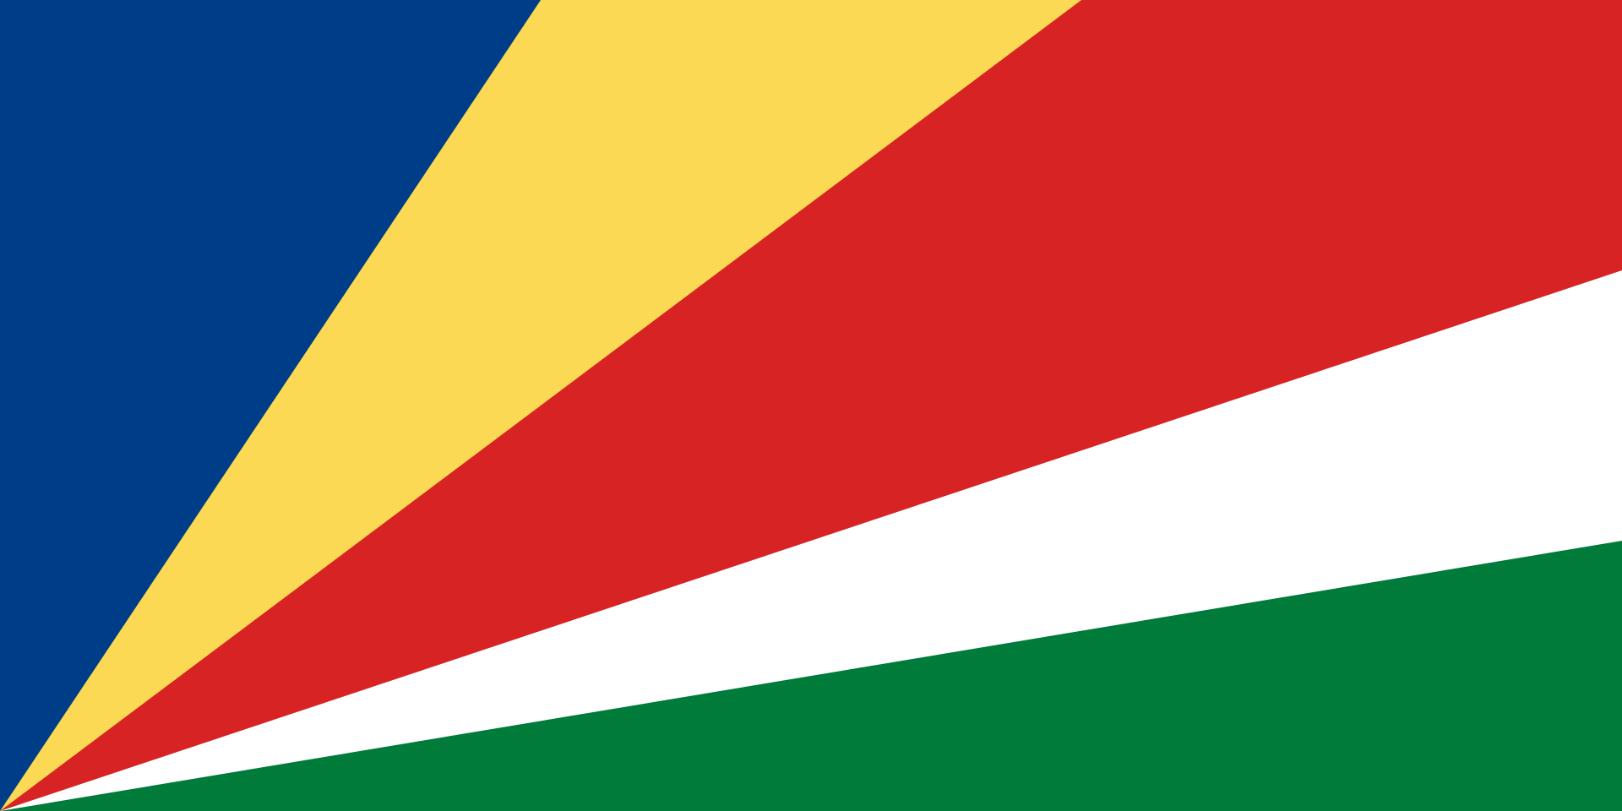 Flagge im Querformat Land Sevchellen 150x100 cm